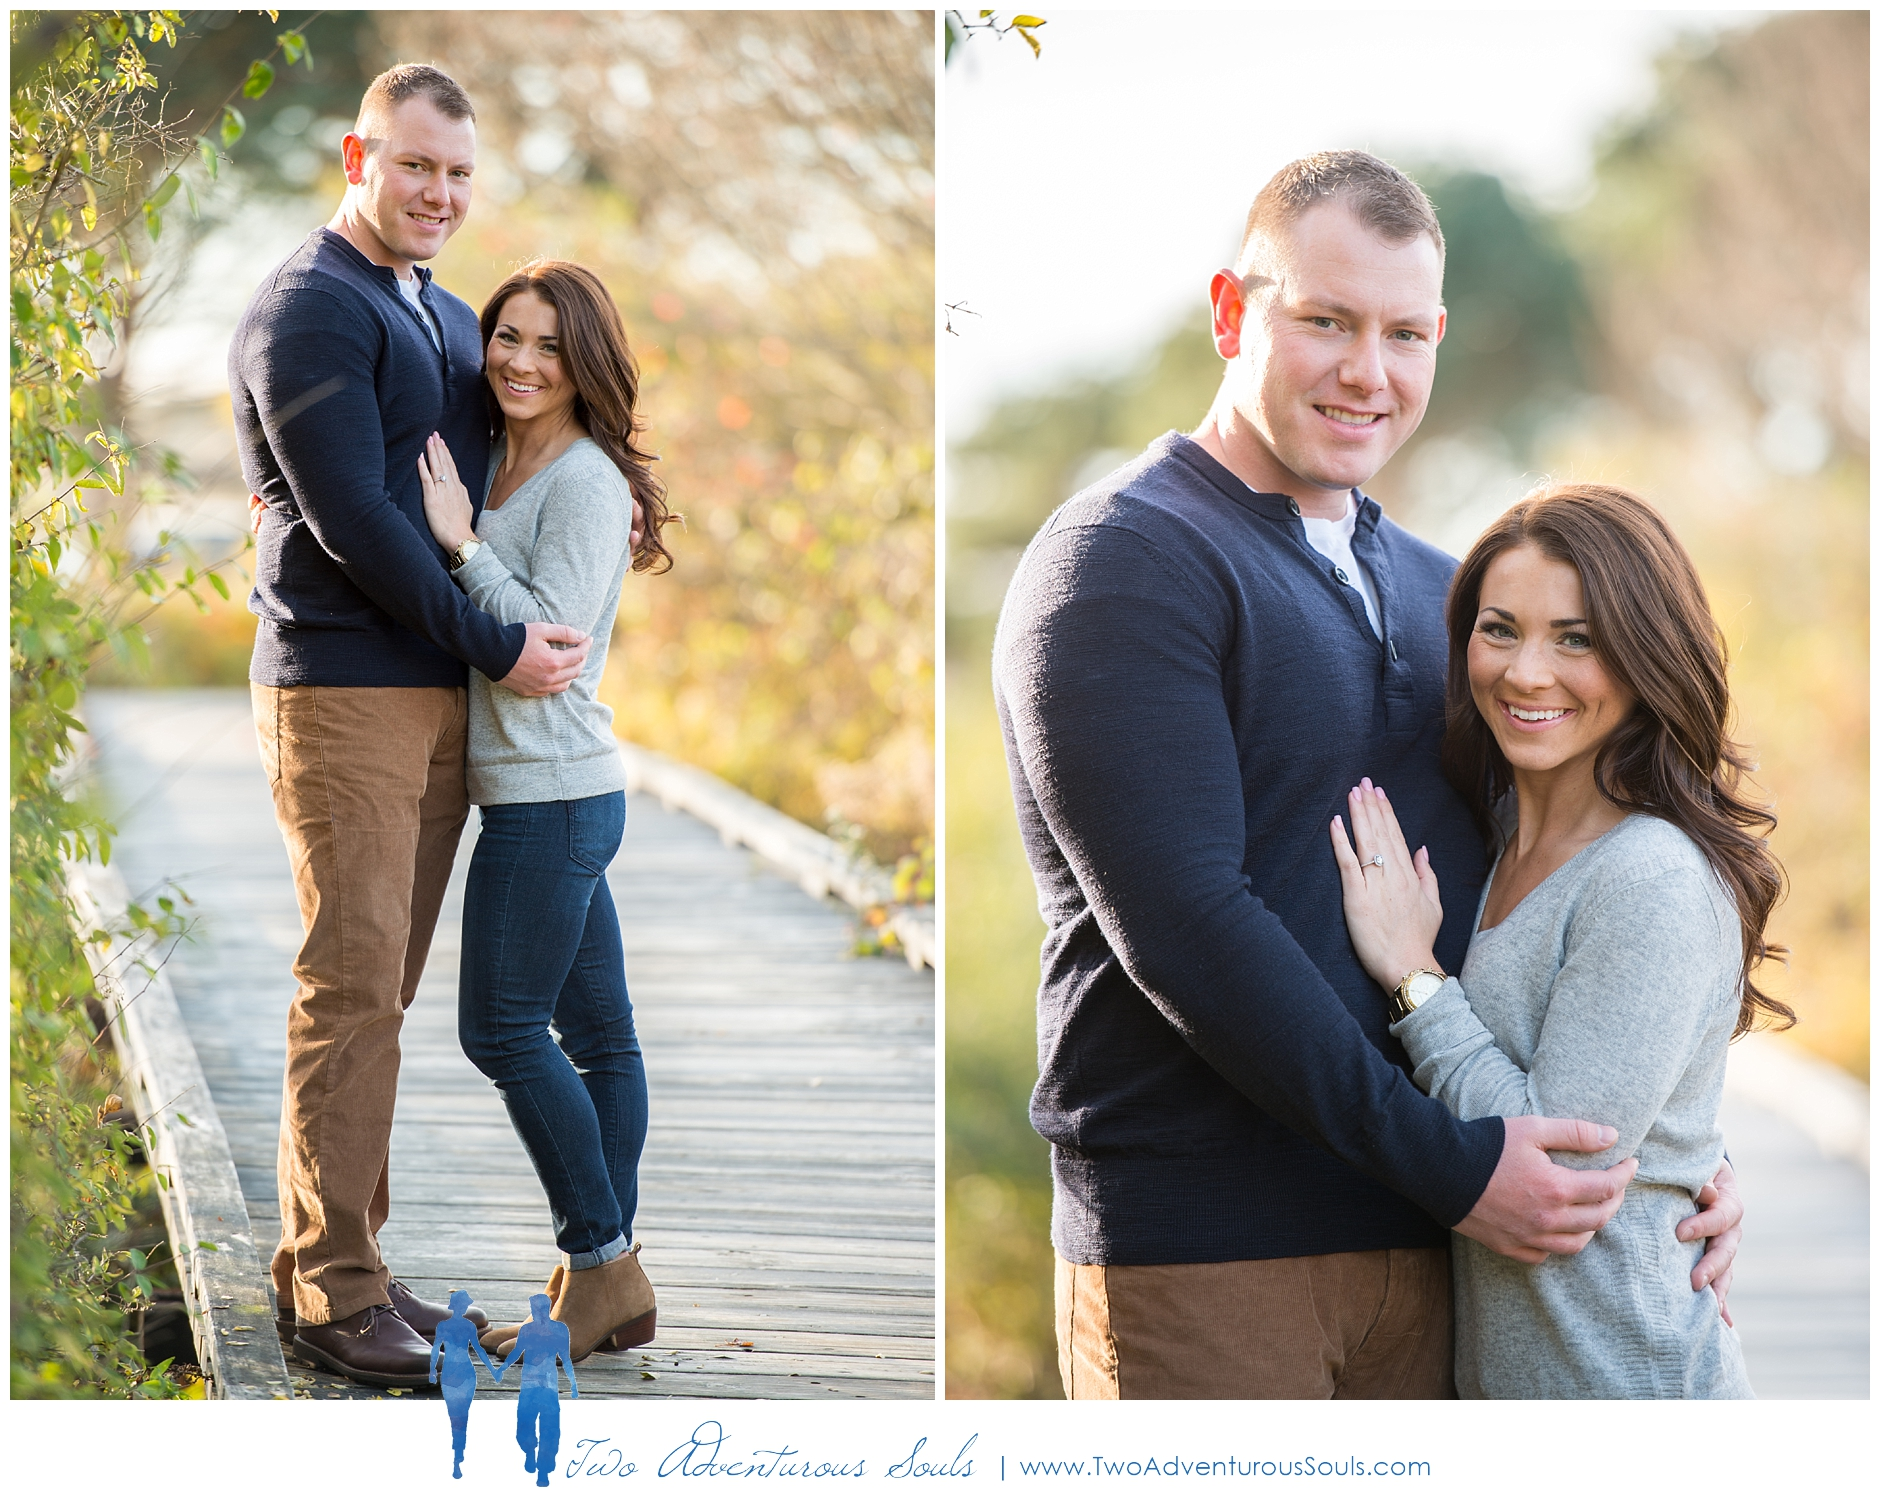 Kettle Cove Engagement Session, Cape Elizabeth, Maine Wedding Photographers -